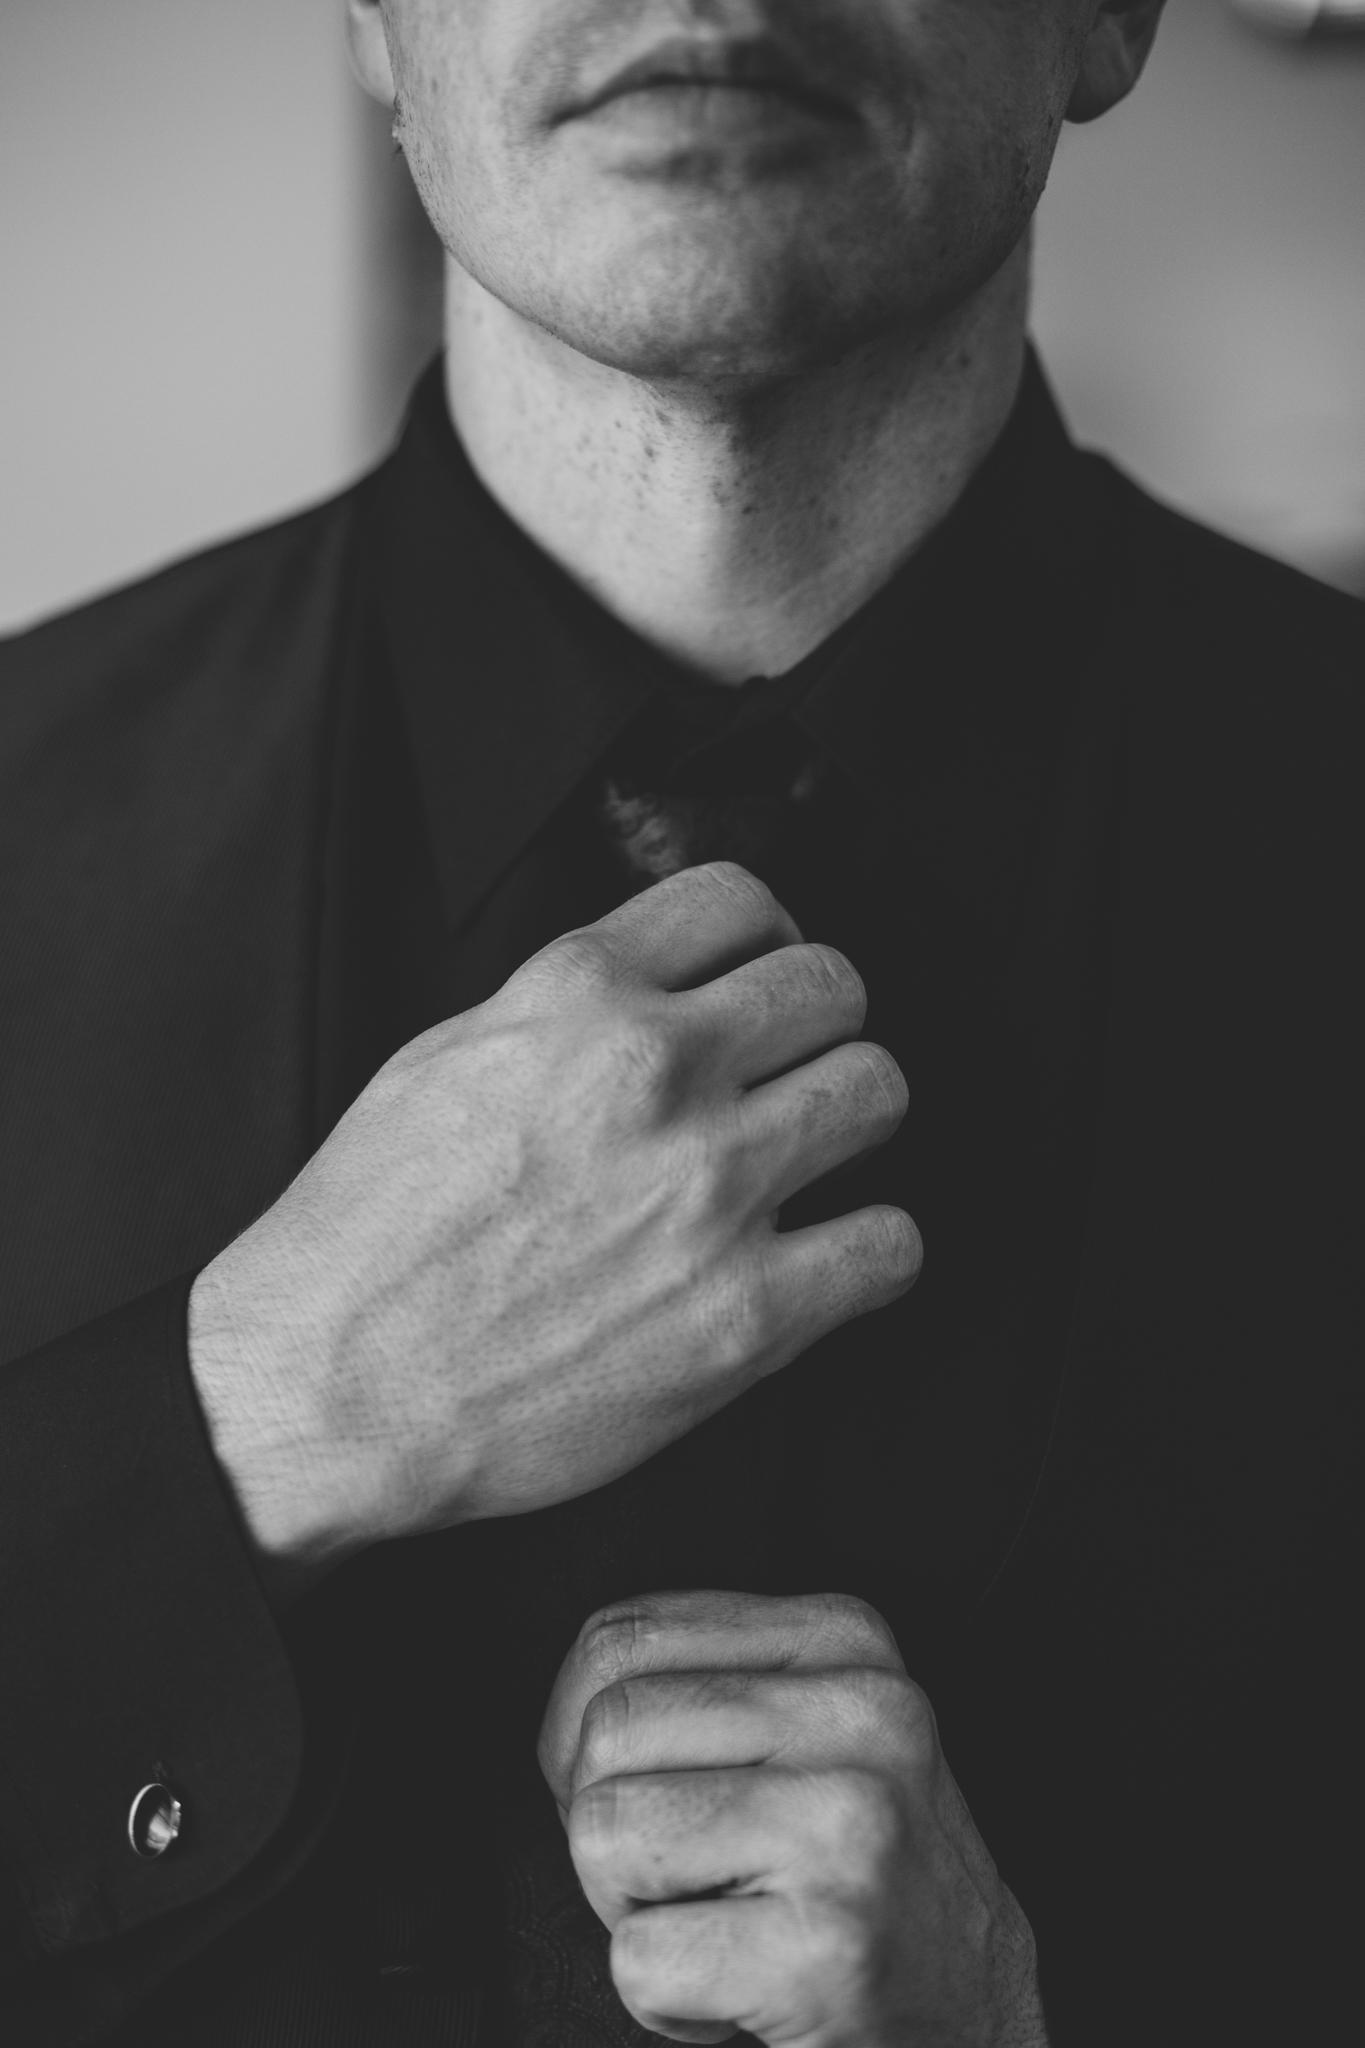 phoenix wedding photography bw groom putting tie on looks sharp mj